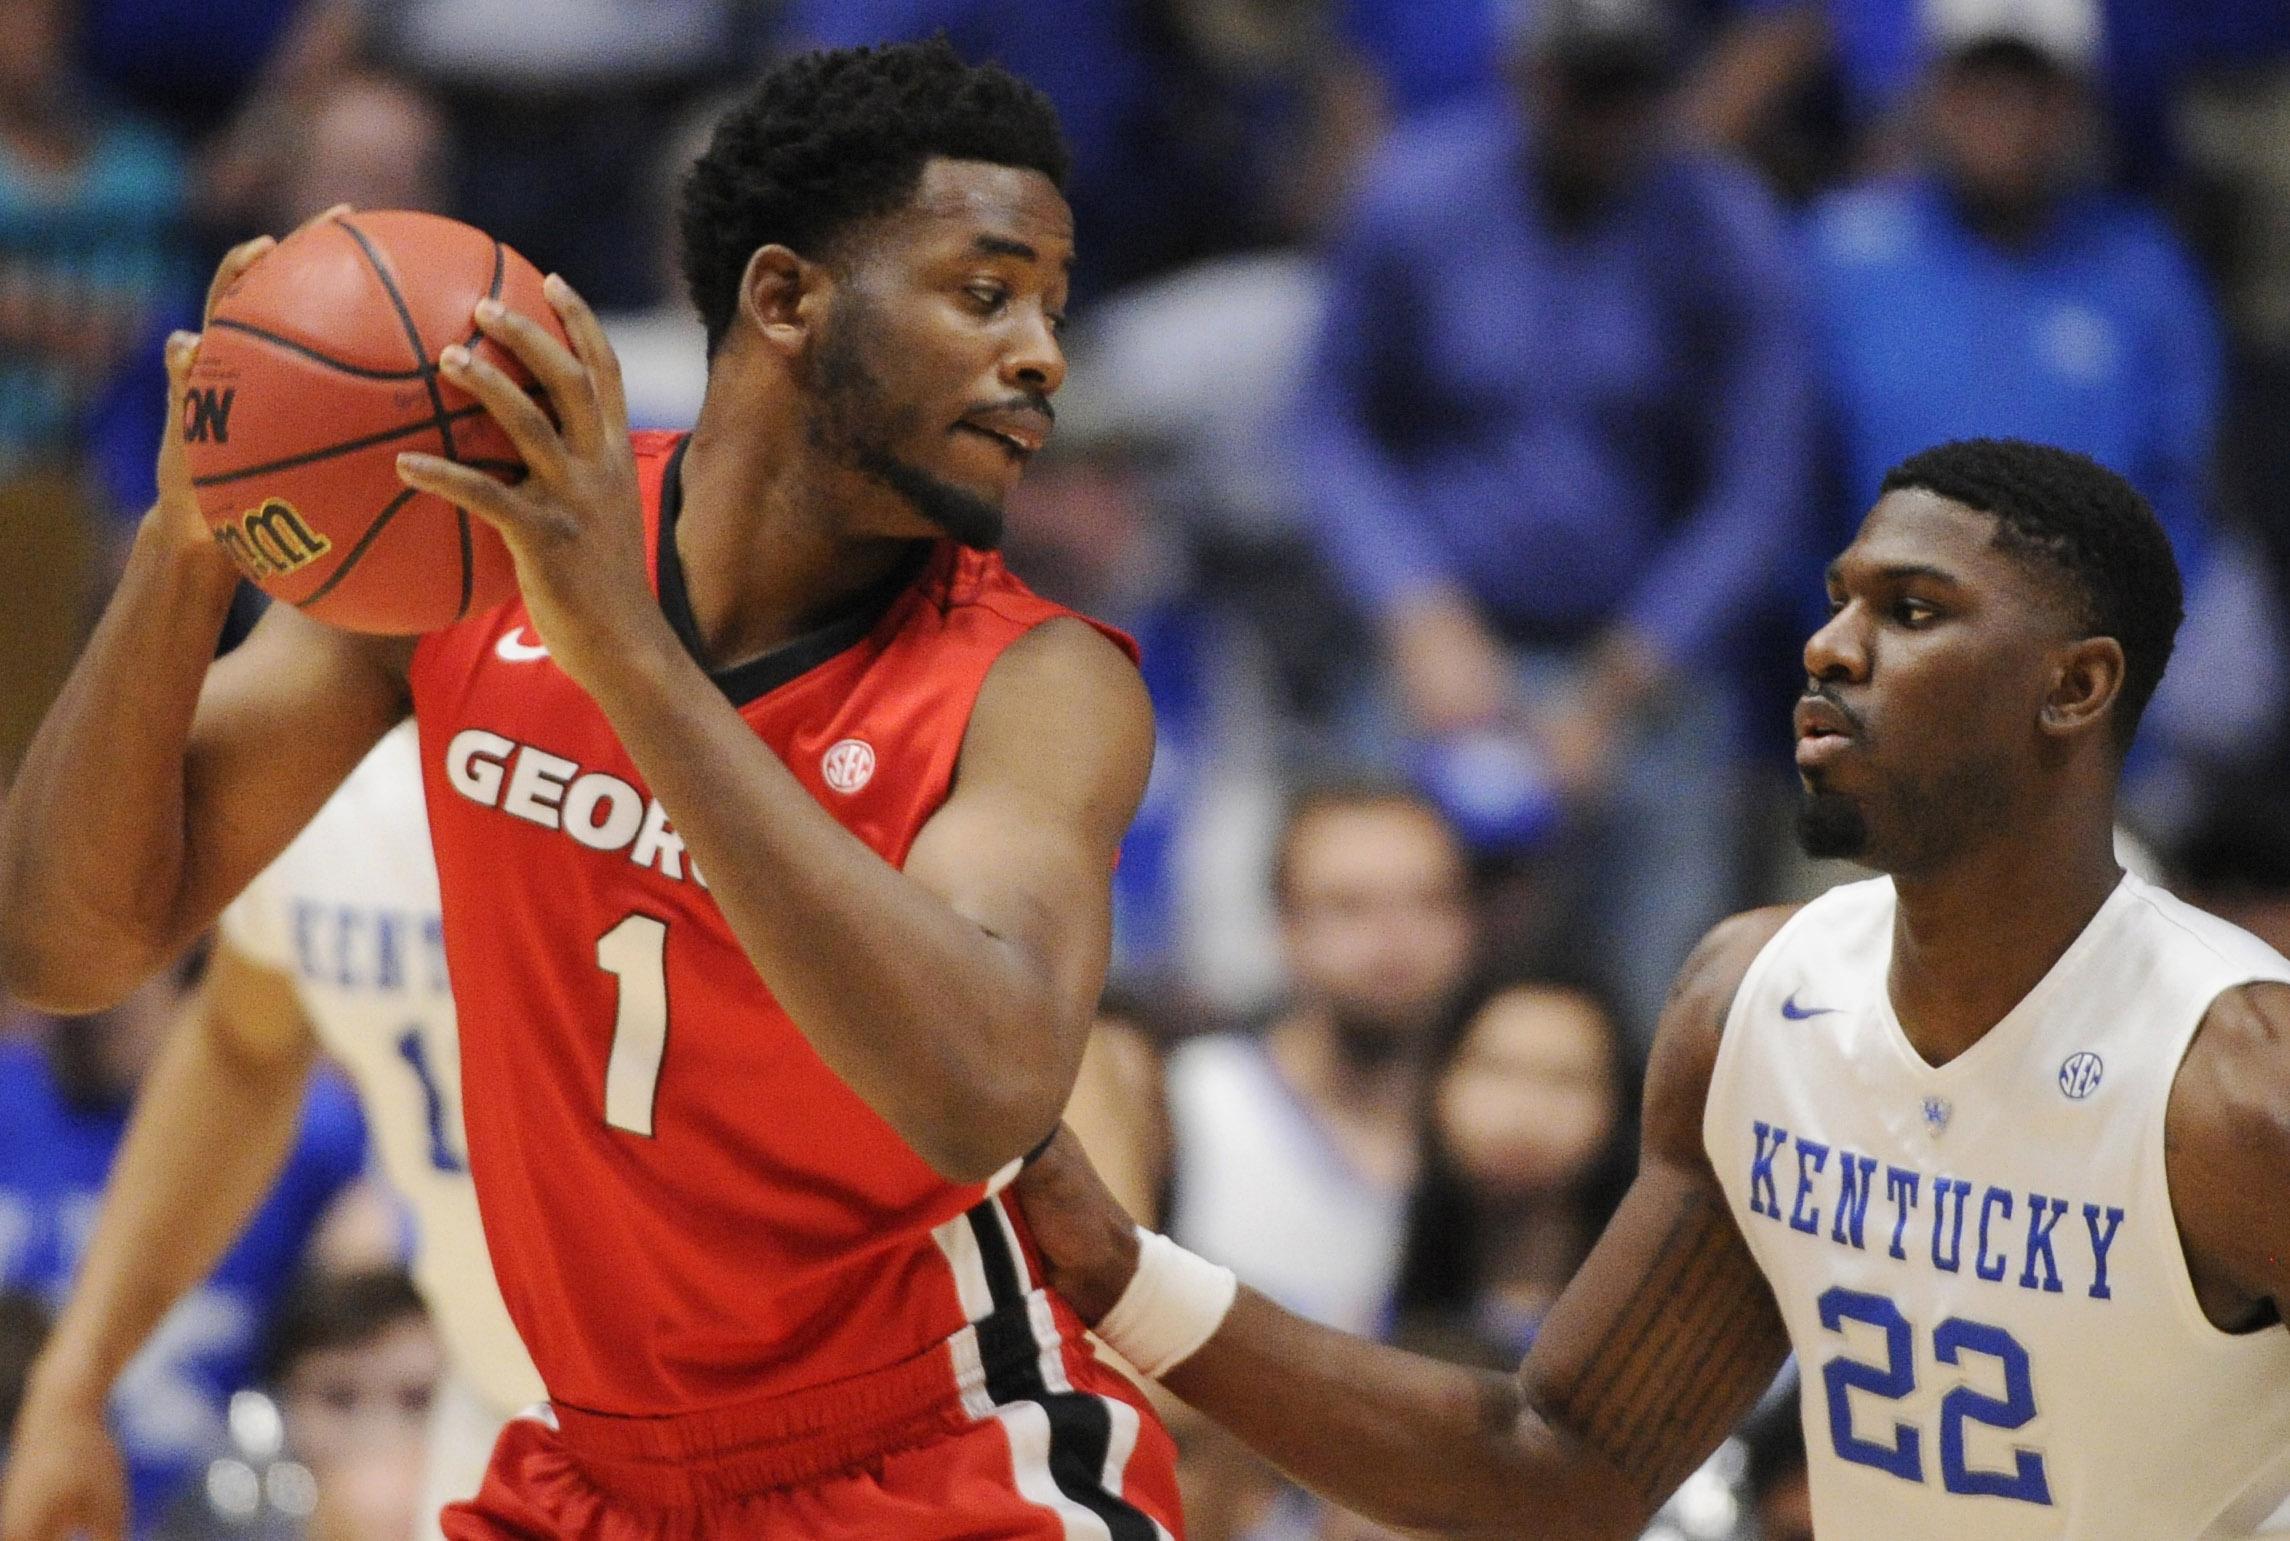 2013 Recruits Uk Basketball And Football Recruiting News: Georgia Bulldogs Basketball Recruiting